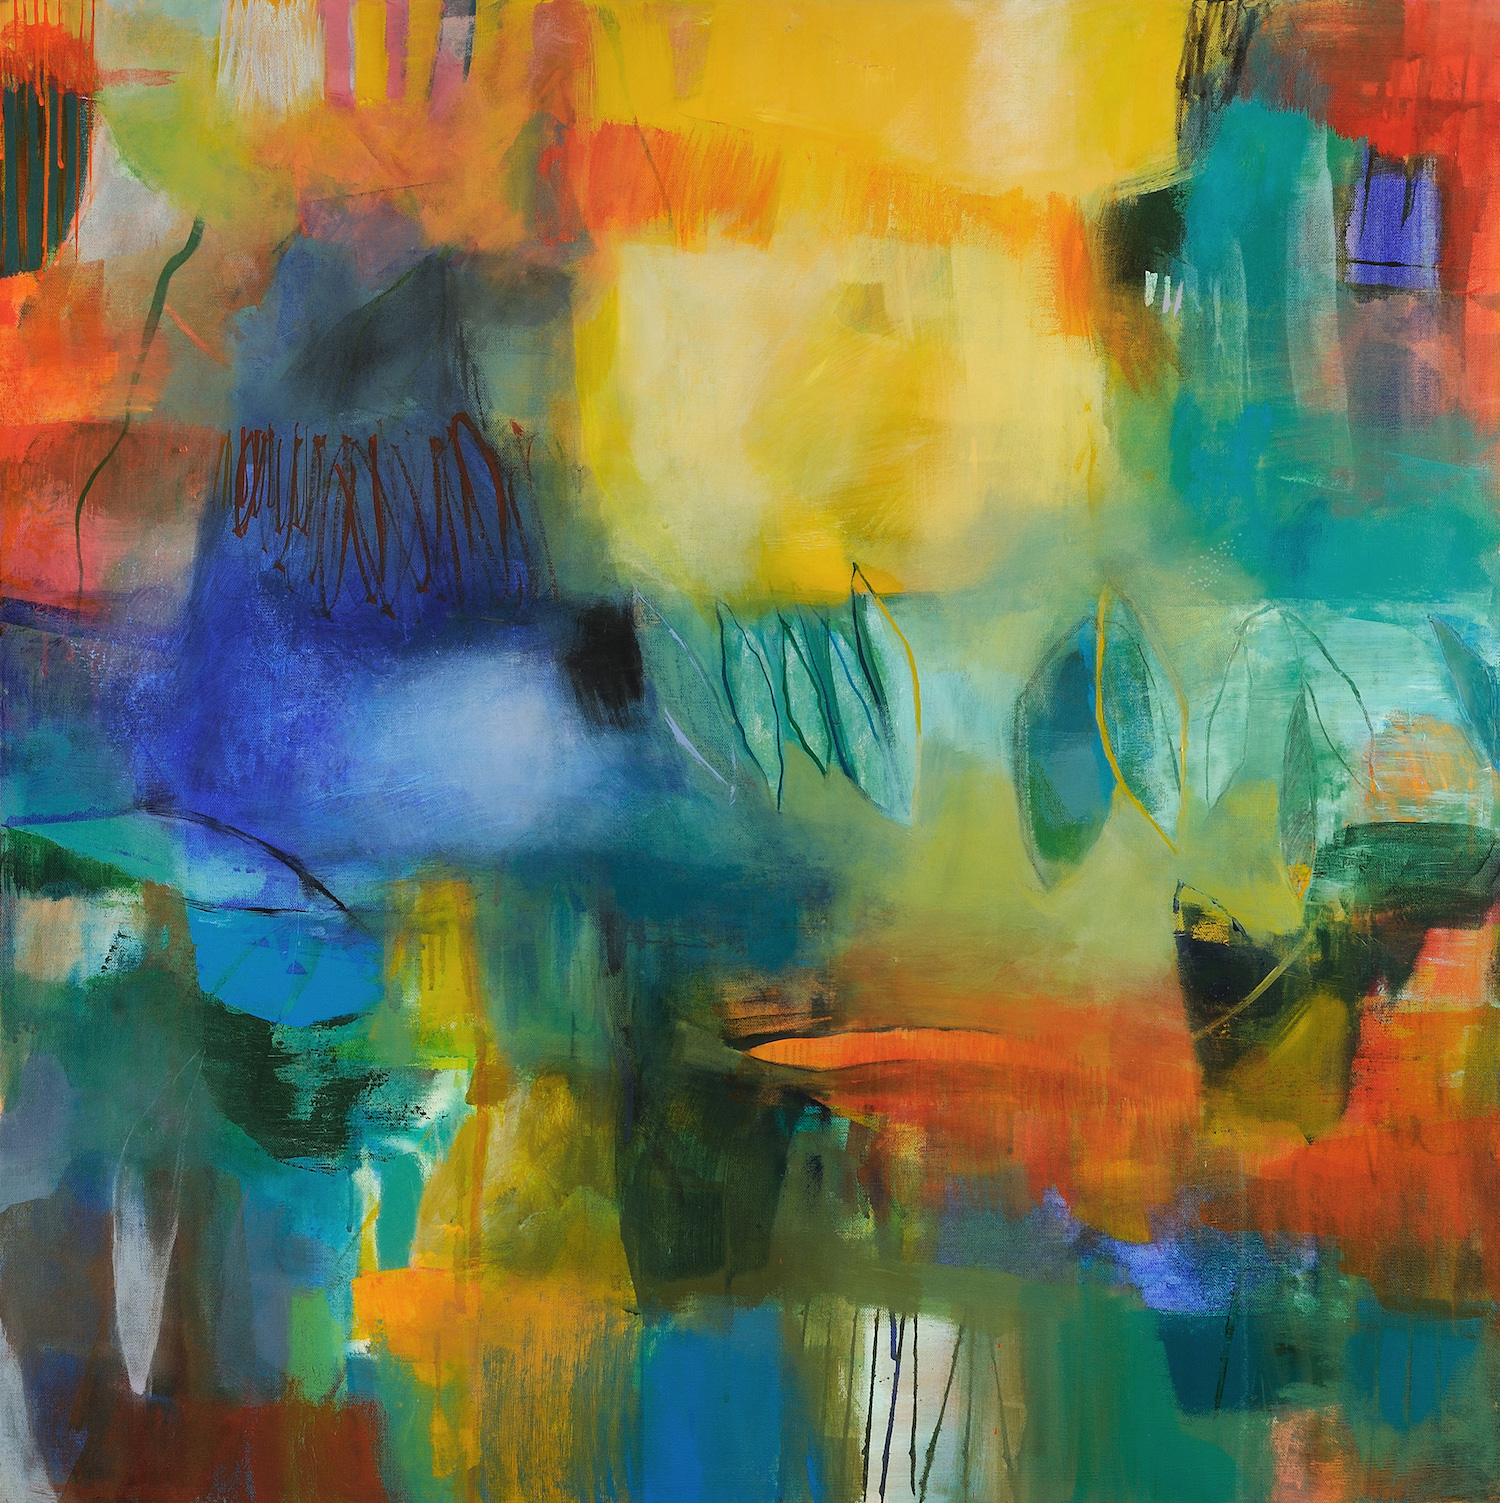 "Jennifer Duncan.  Leaves Fell .Mixed Medium on Canvas.36"" x 36"". 2017"